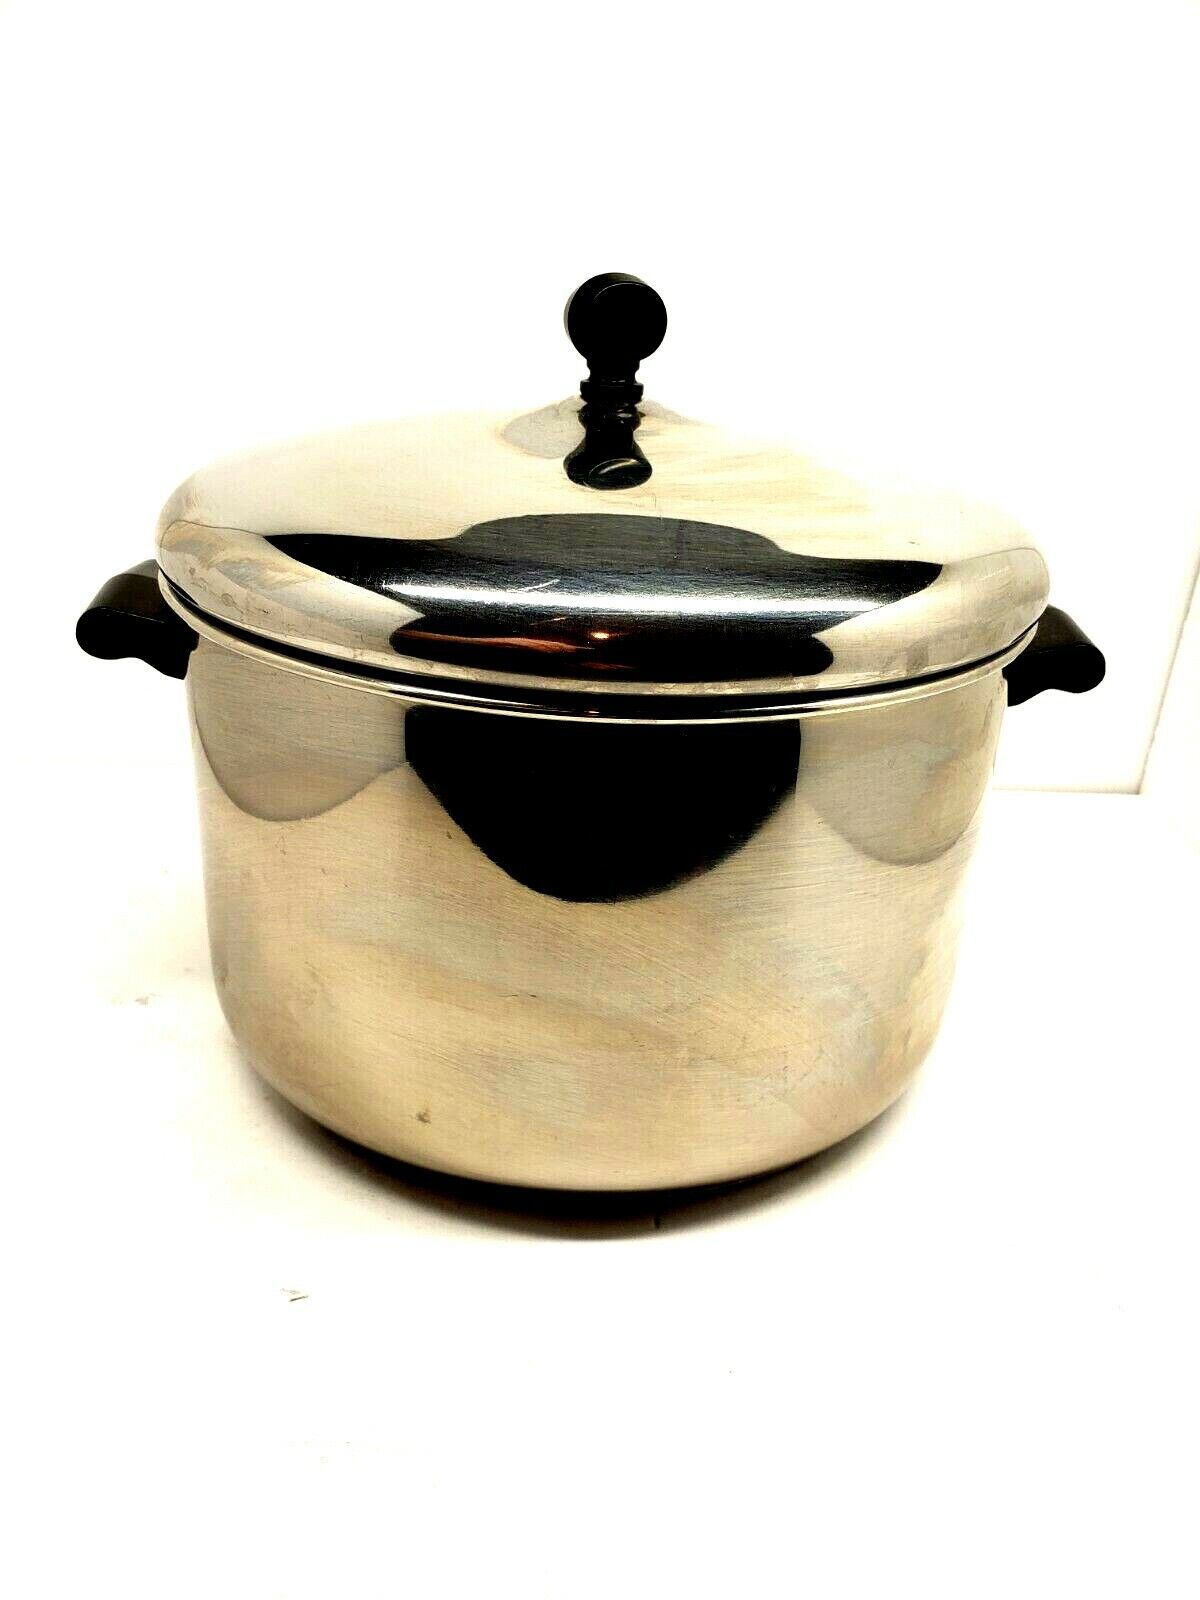 Vintage FARBERWARE 8 Qt Stock Pot Pan Aluminum Clad Stainles